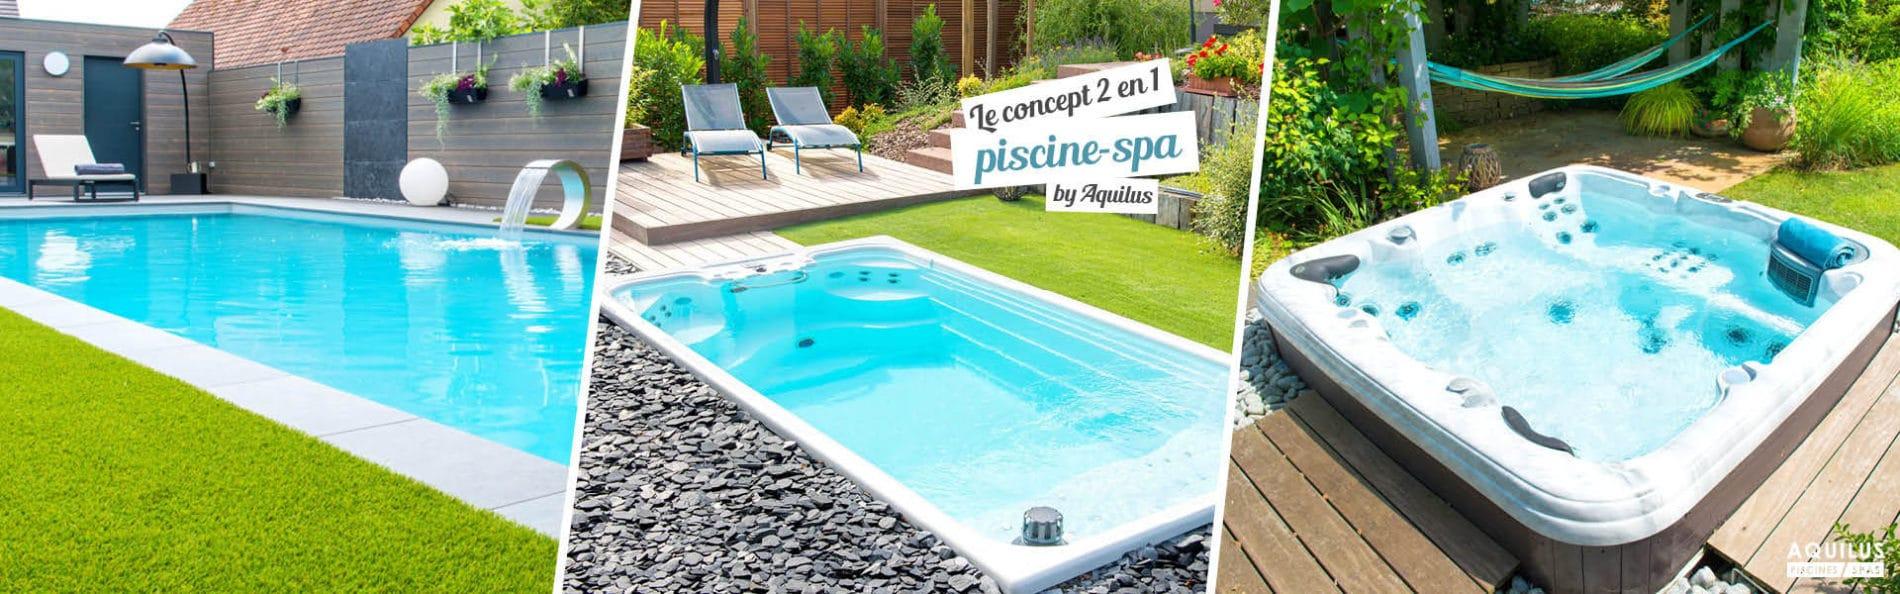 Aquilus piscines & Spas Uzès